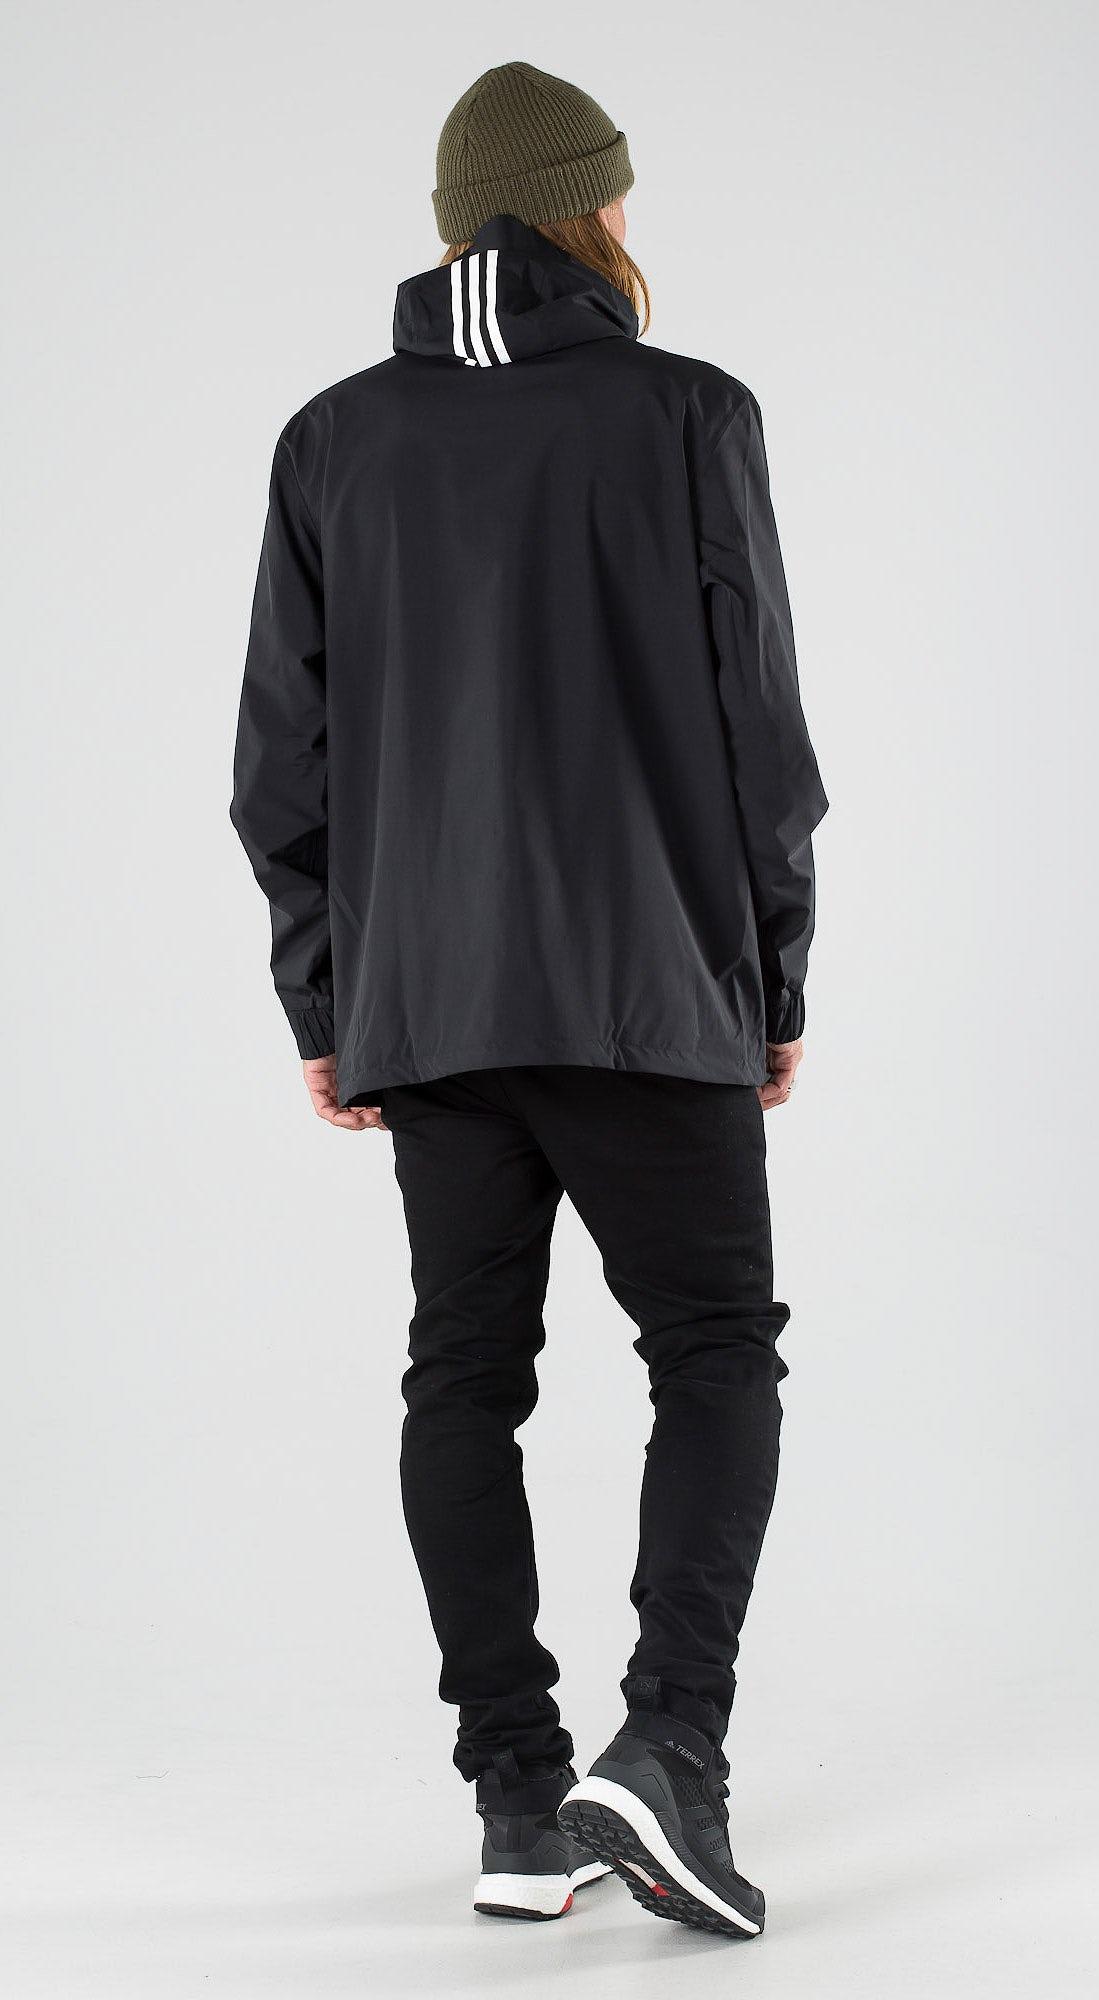 Adidas Terrex BSC 3S Rain RDY Black